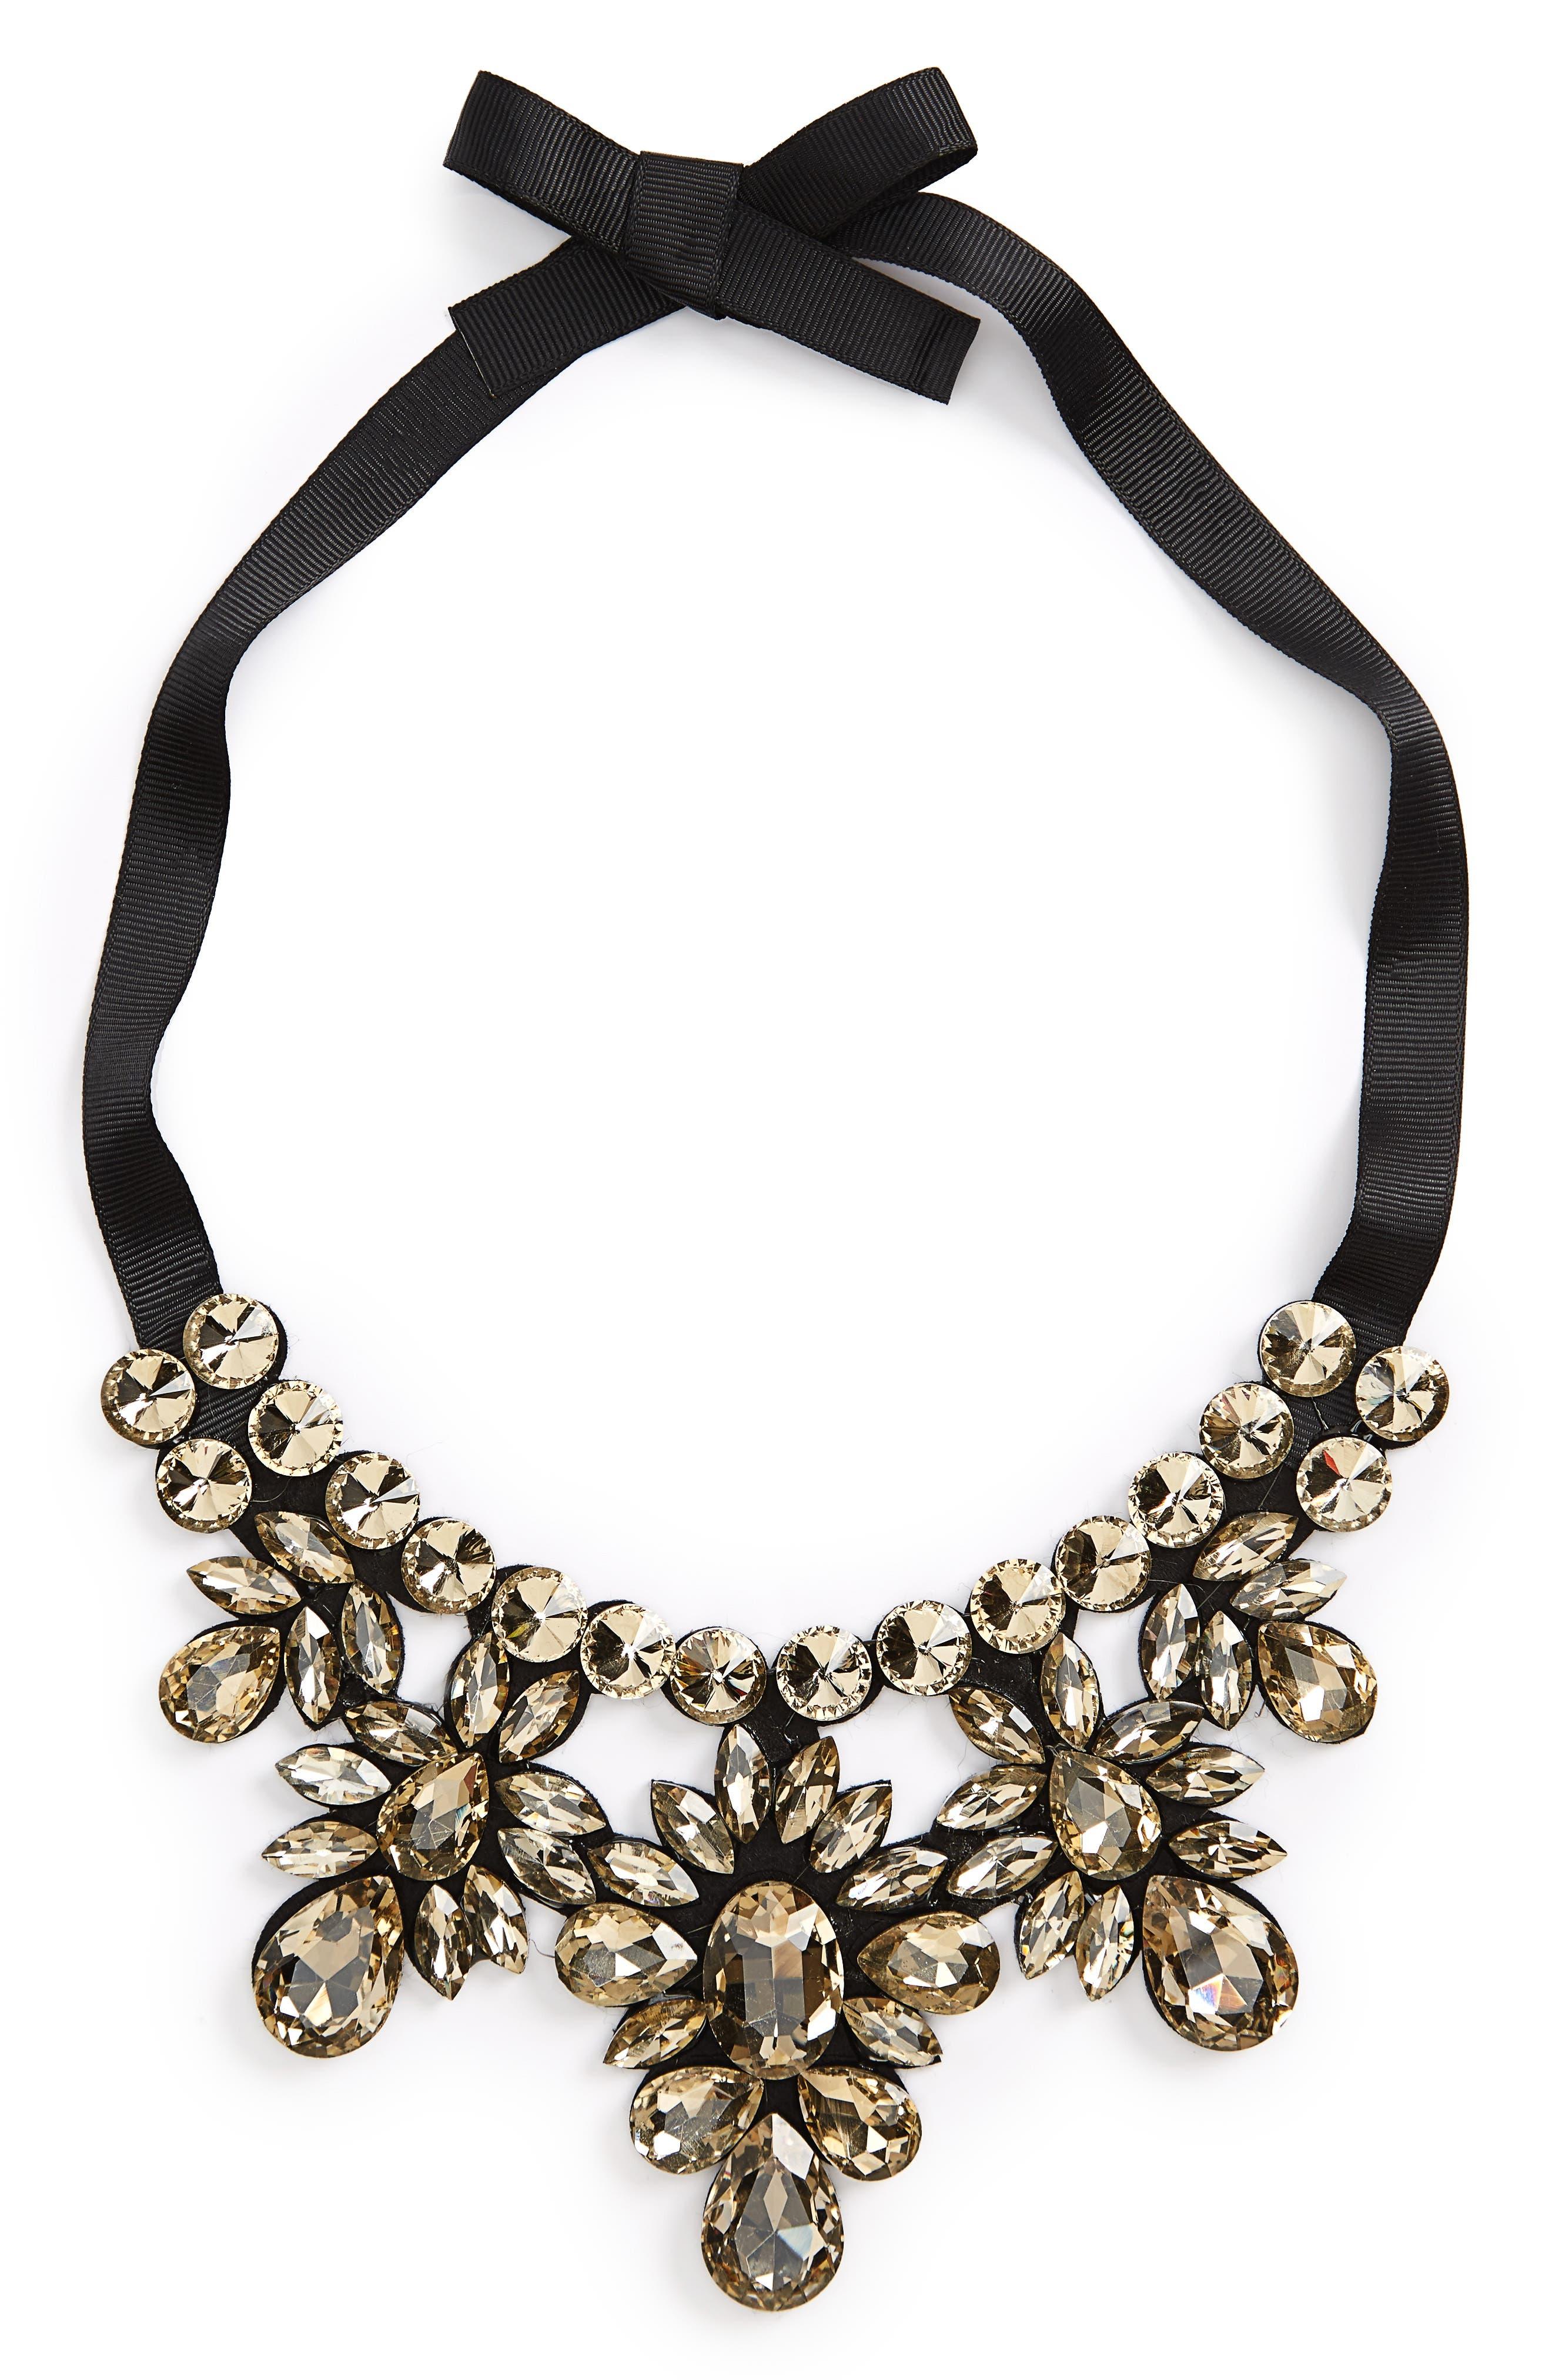 Alternate Image 1 Selected - Topshop Crystal Statement Necklace